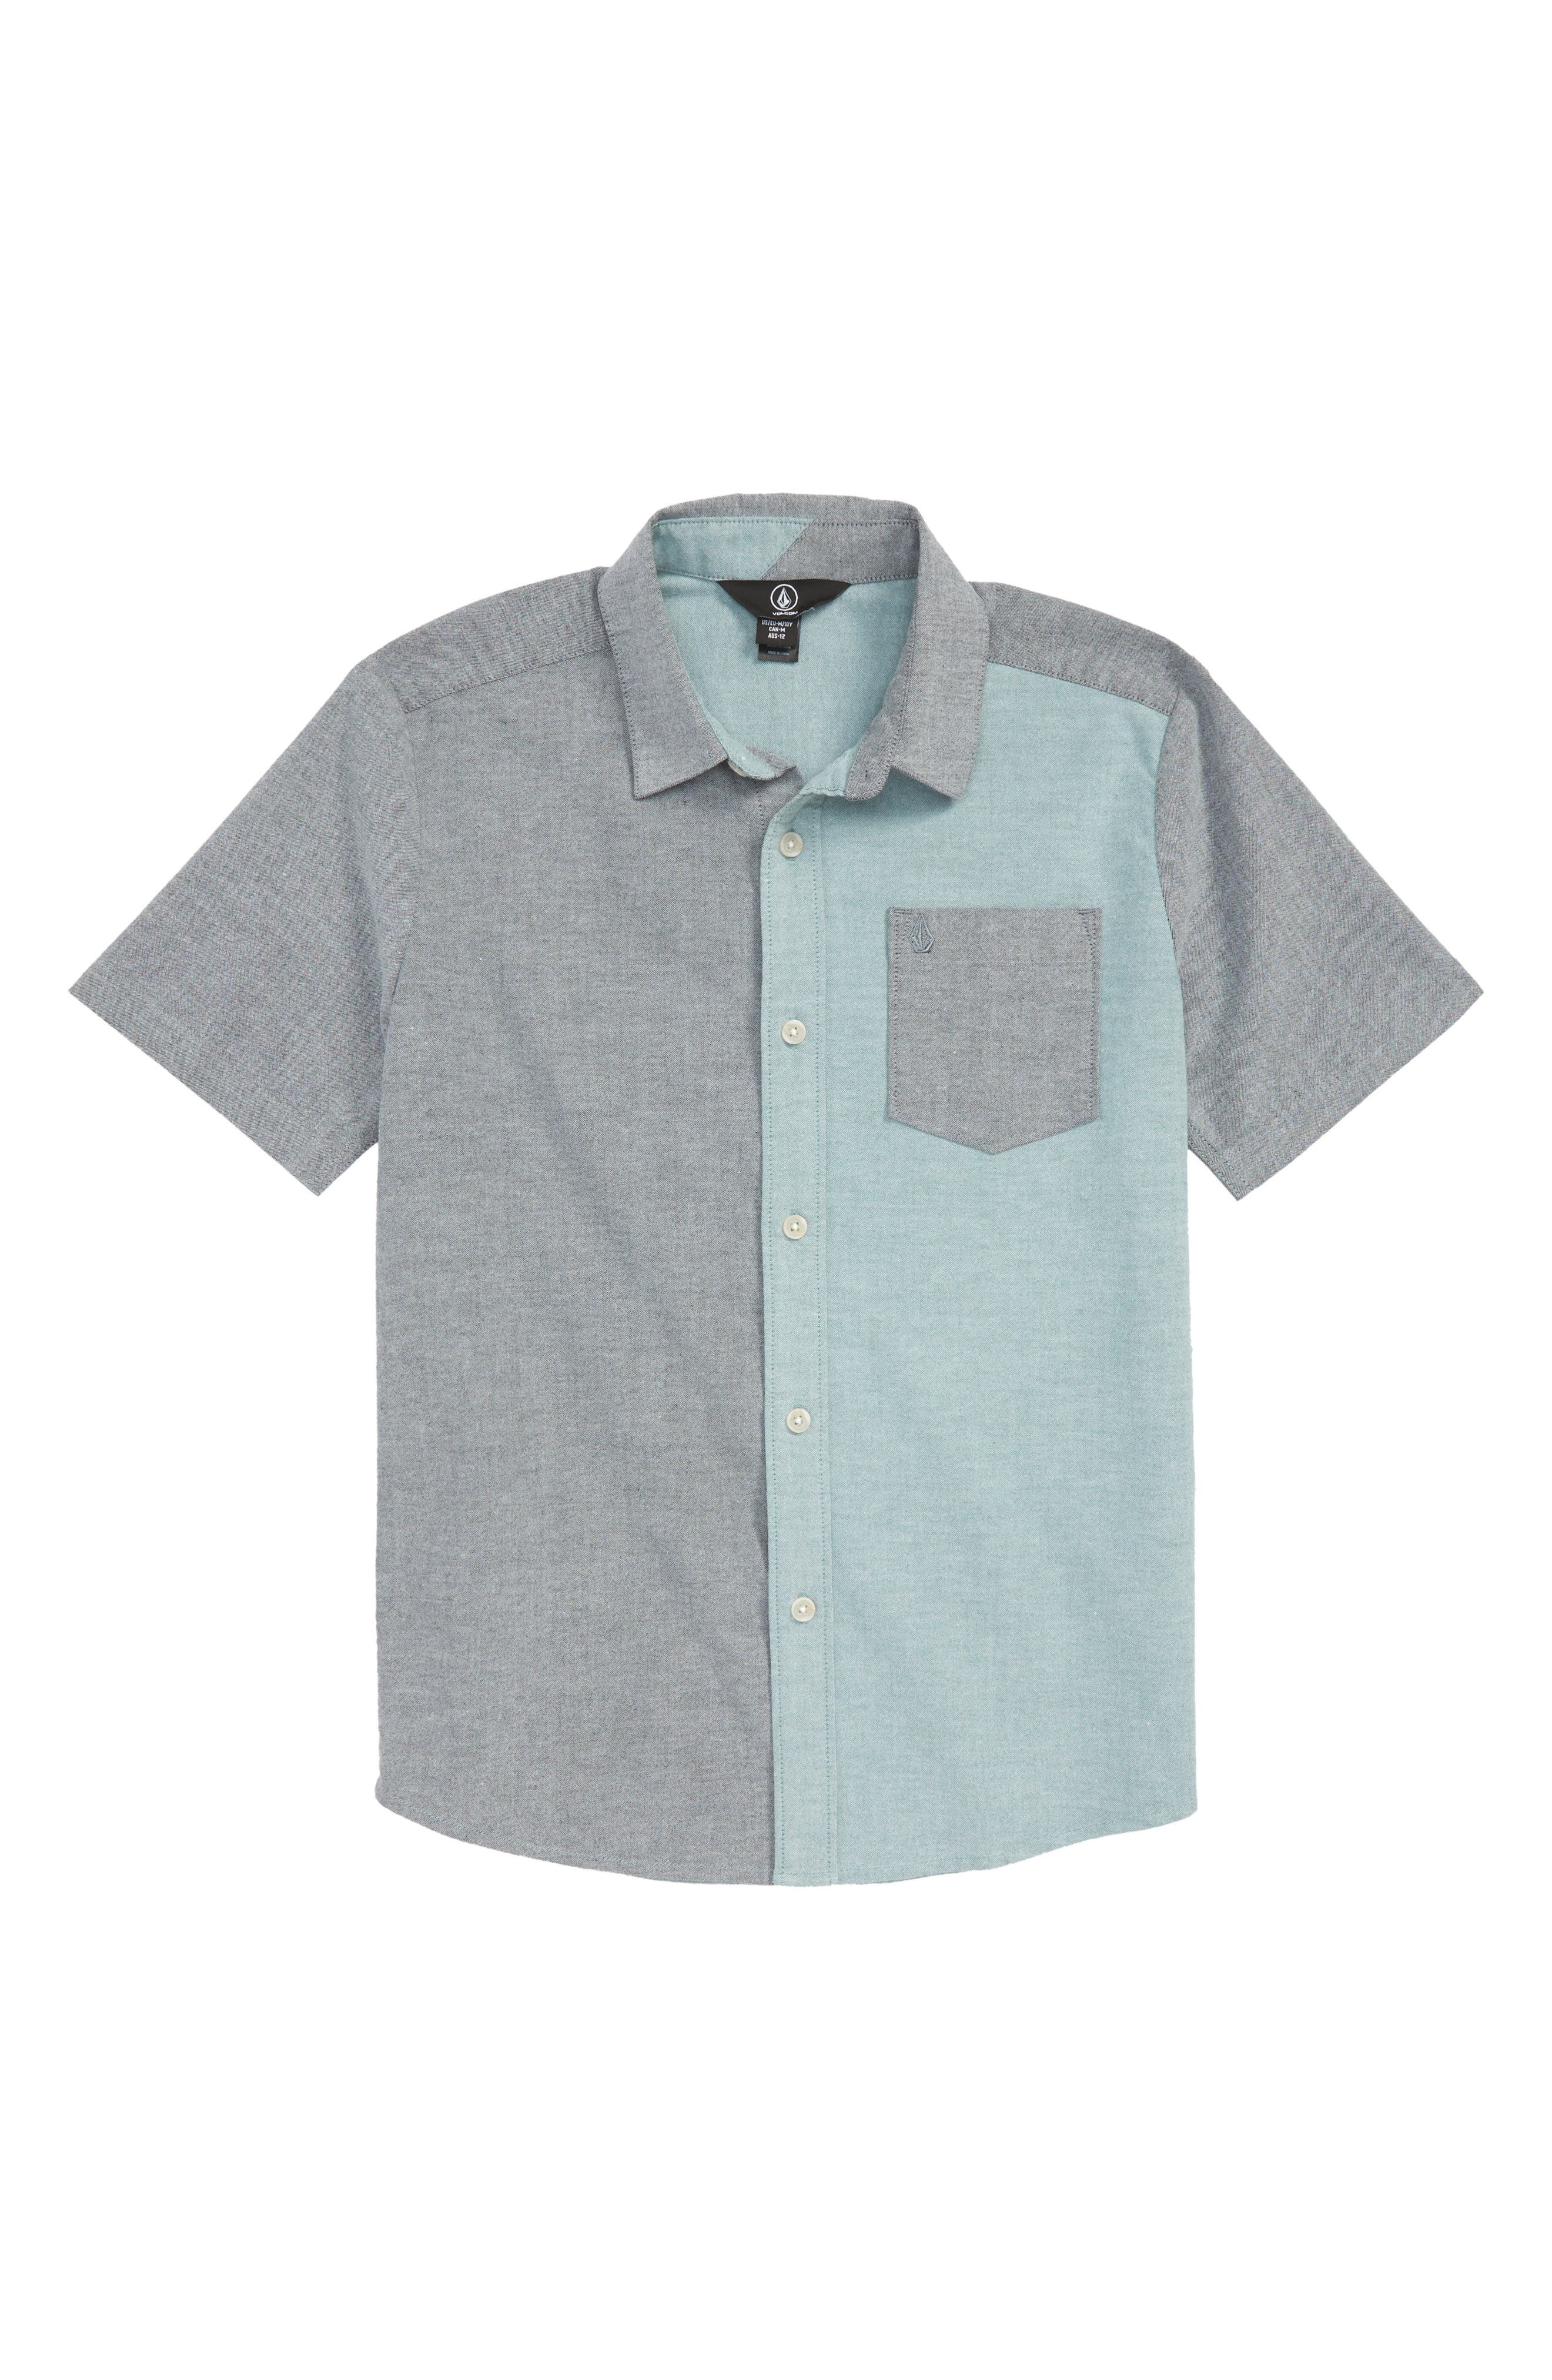 Everett Woven Shirt,                             Main thumbnail 1, color,                             400